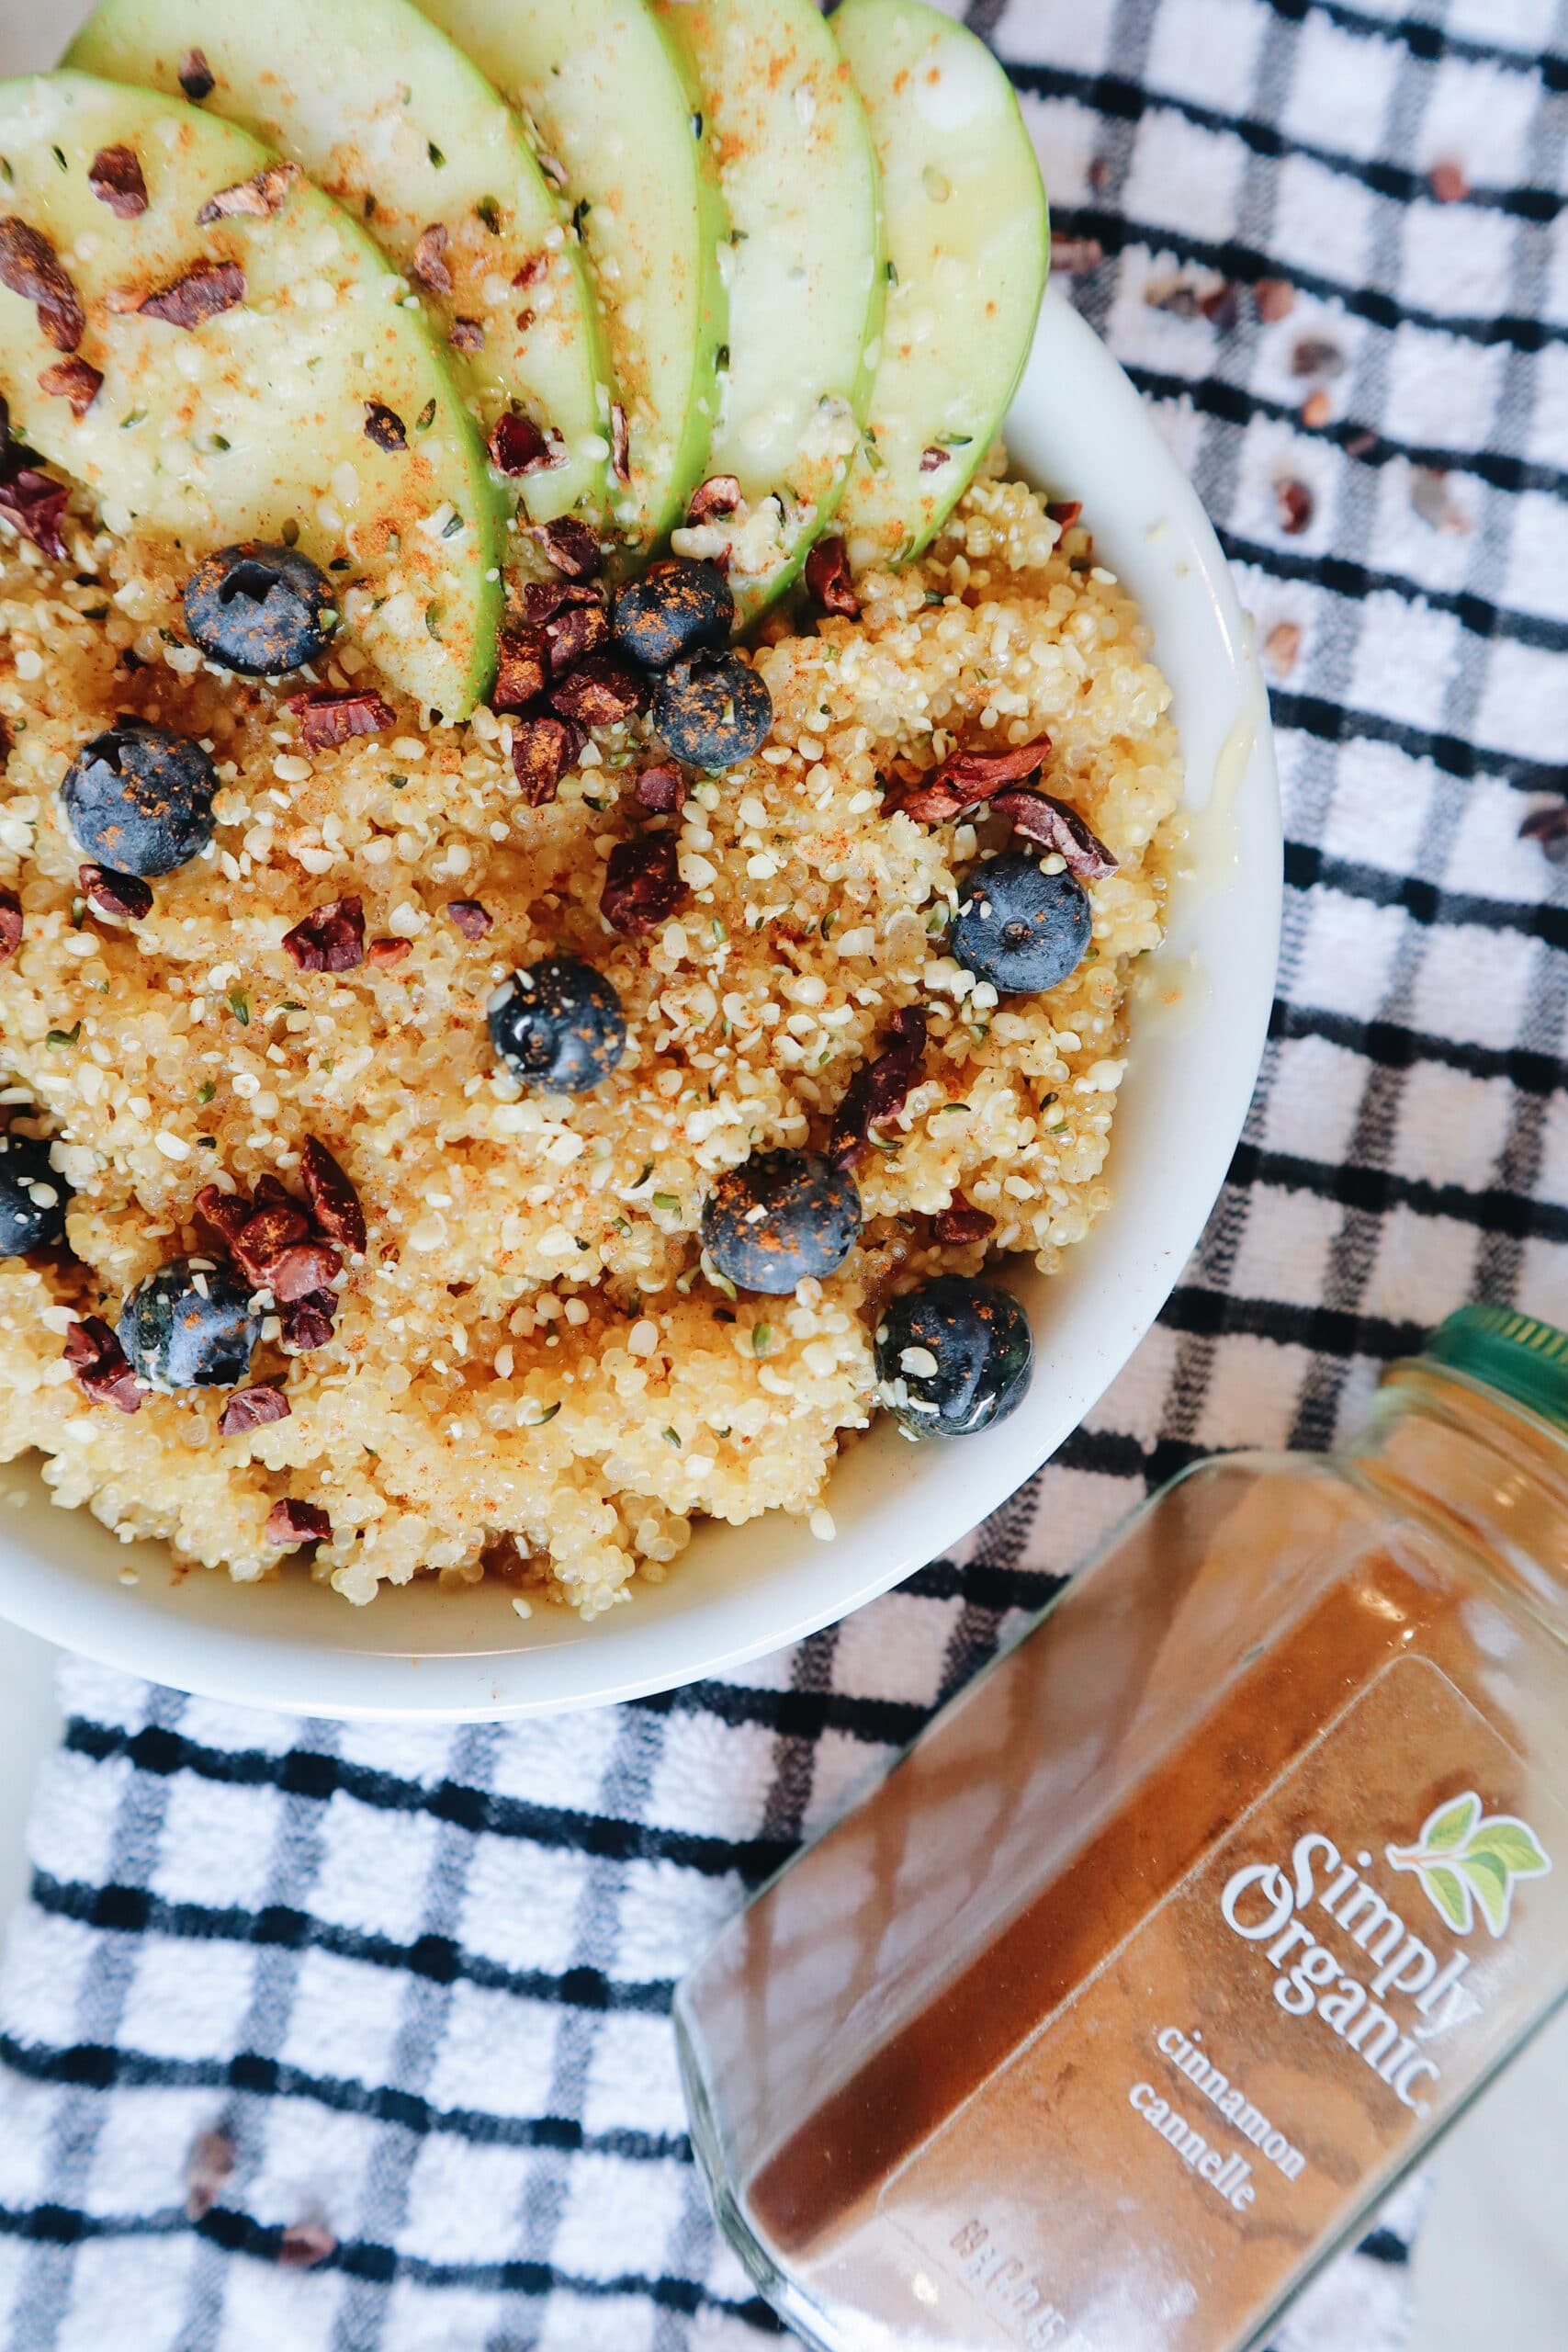 enjoy your coconut quinoa breakfast bowl sauce